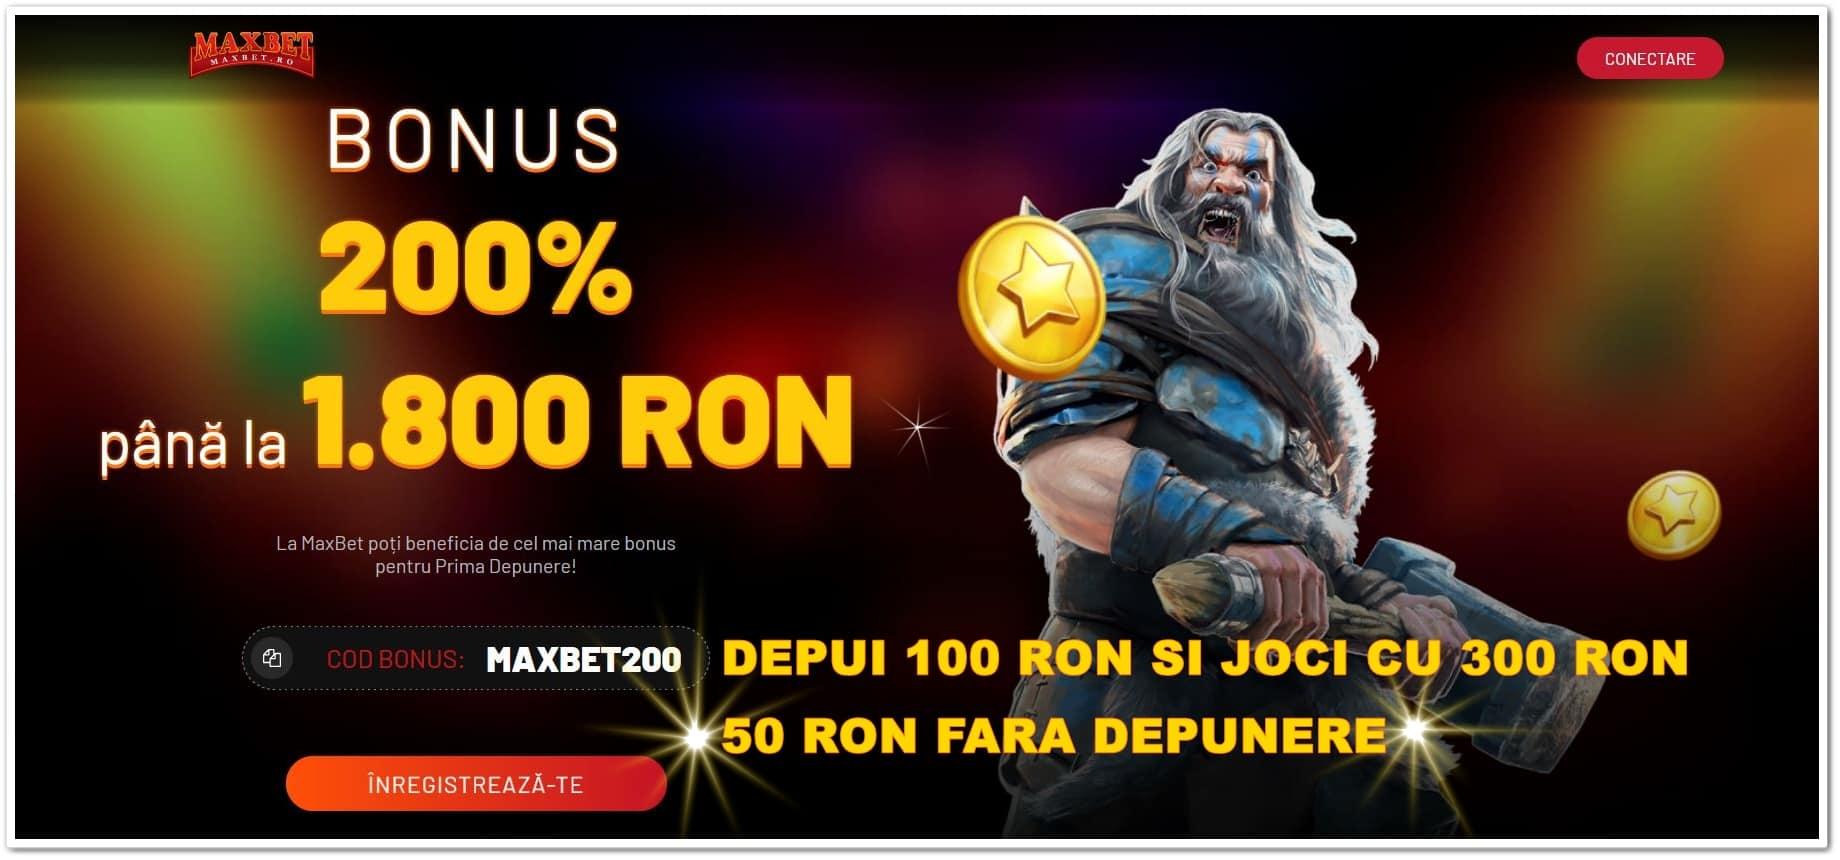 Cel mai mare bonus la casino online si 50 ron fara depunere